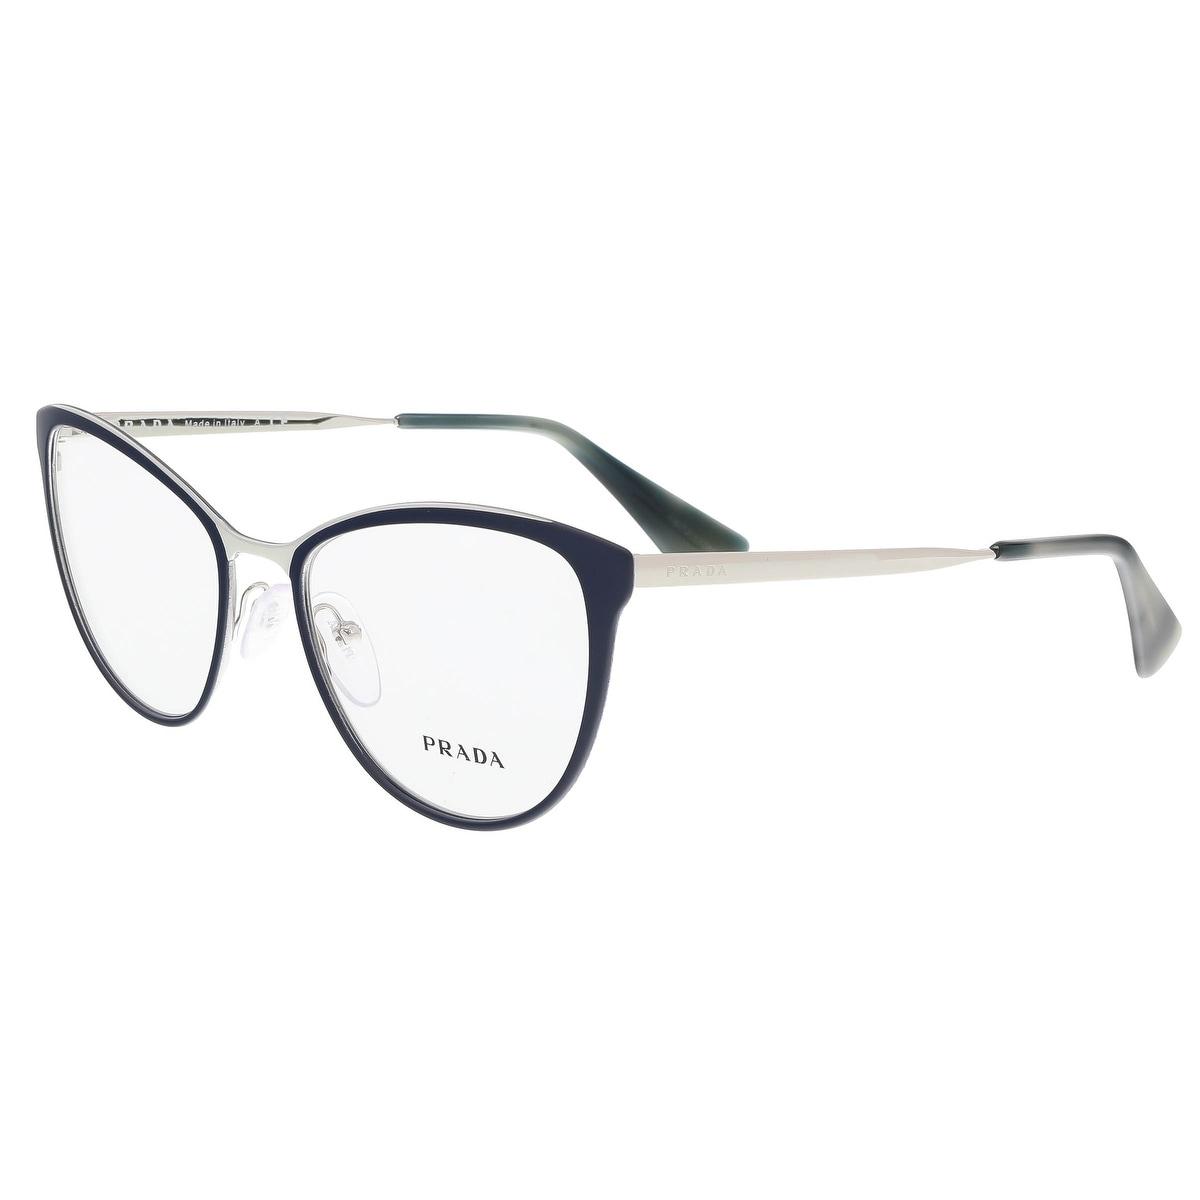 8412236ce970 Shop Prada PR 55TV U6R1O1 Matte Blue/Silver Cat Eye Optical Frames -  52-18-140 - Free Shipping Today - Overstock - 17768344